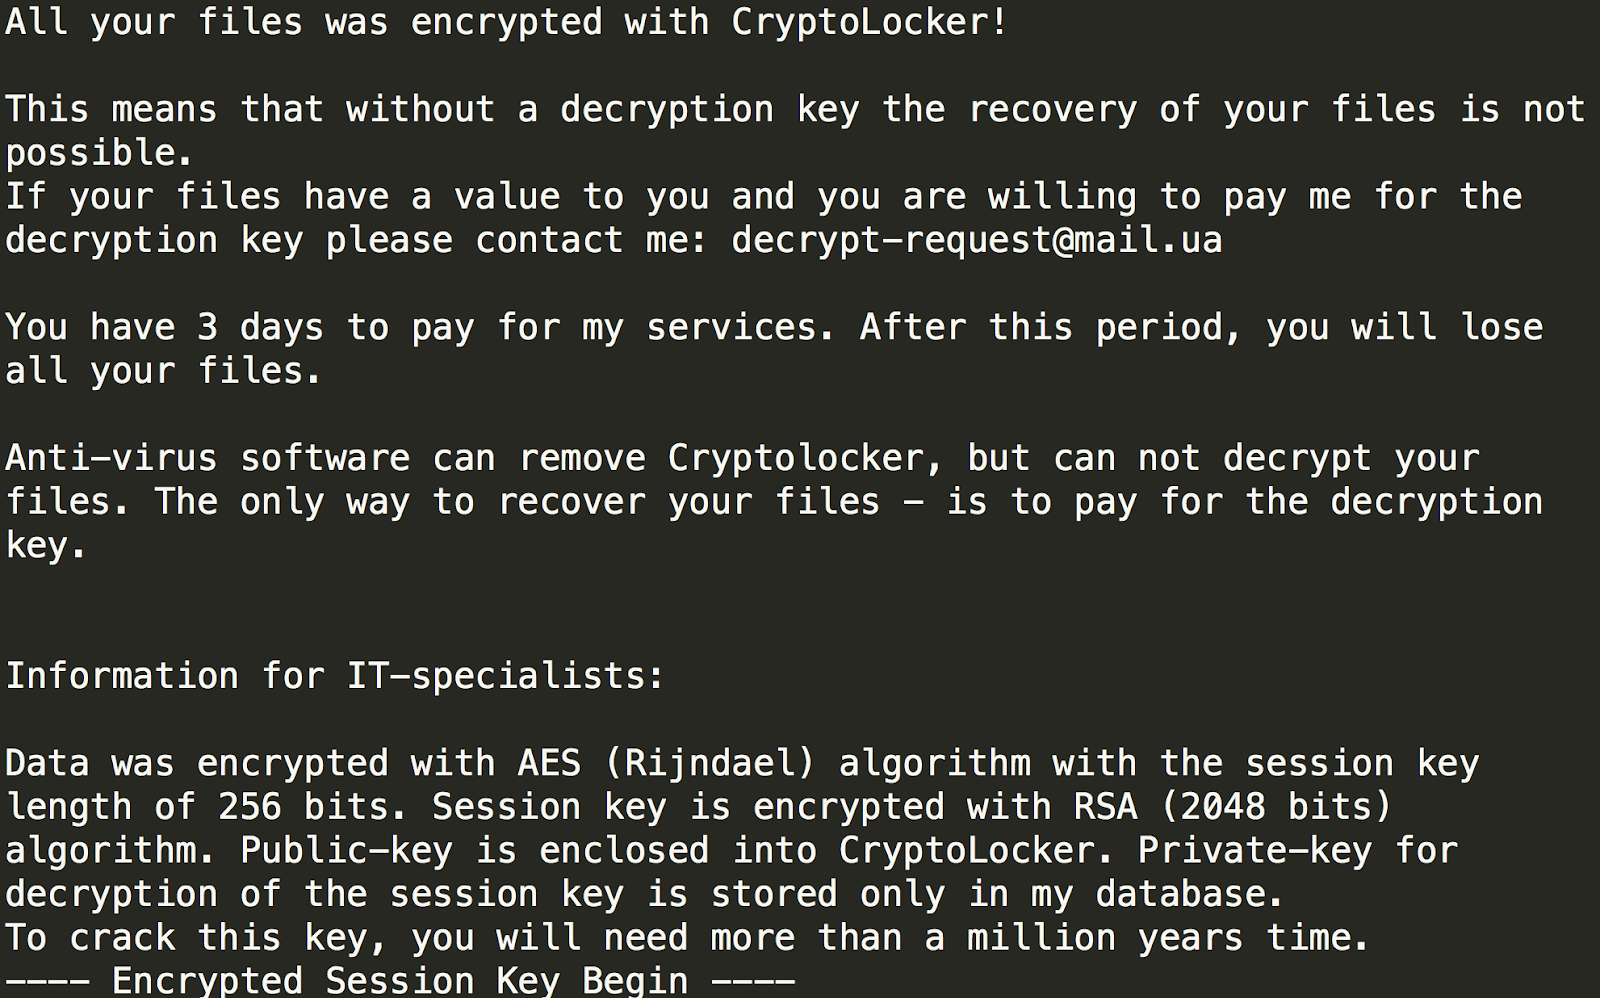 endgame-ransom-note-class-cryptolocker-blog.png